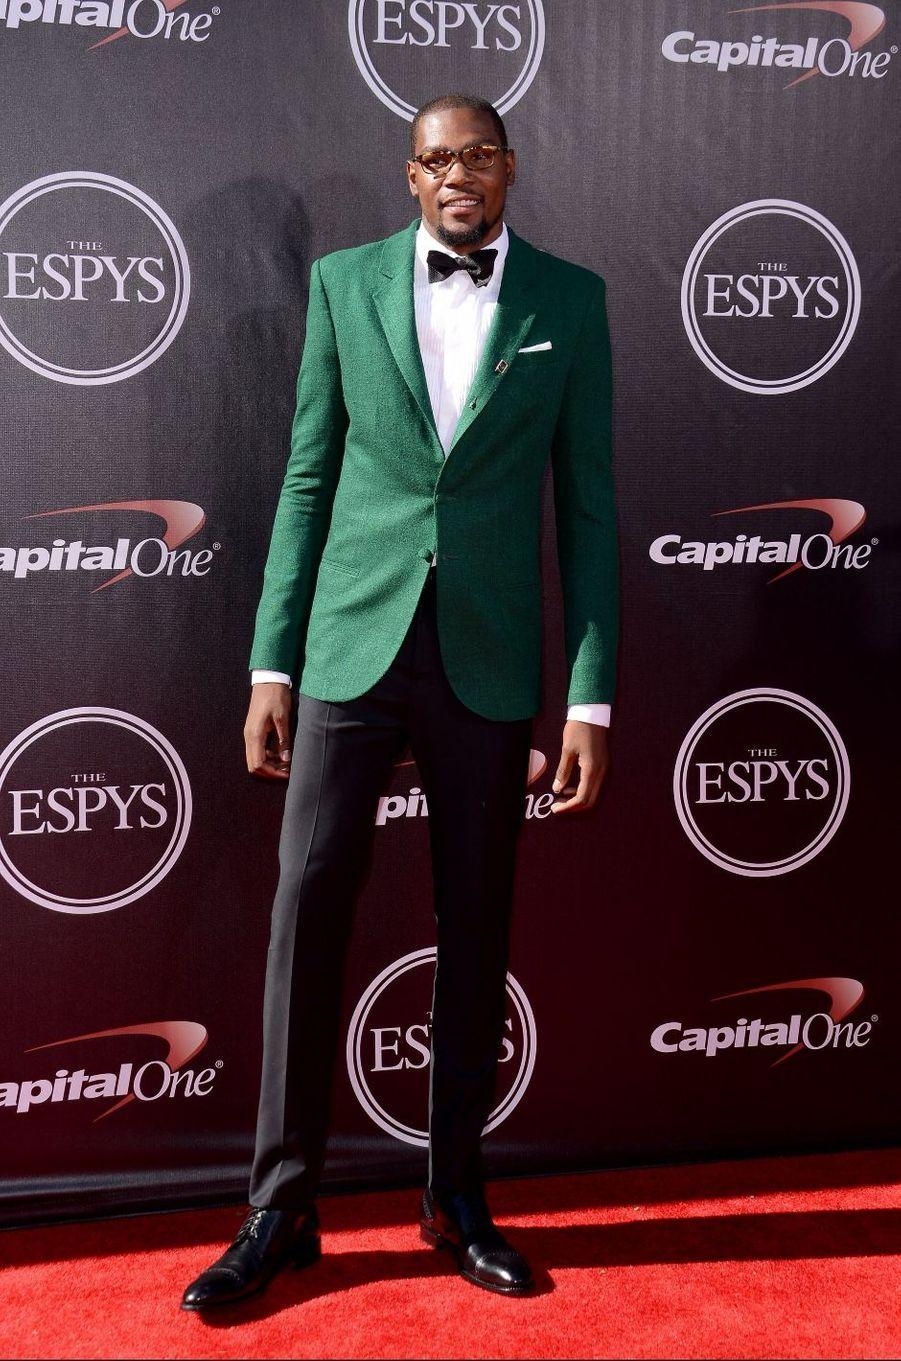 24 - Kevin Durant, 63,9 millions de dollars